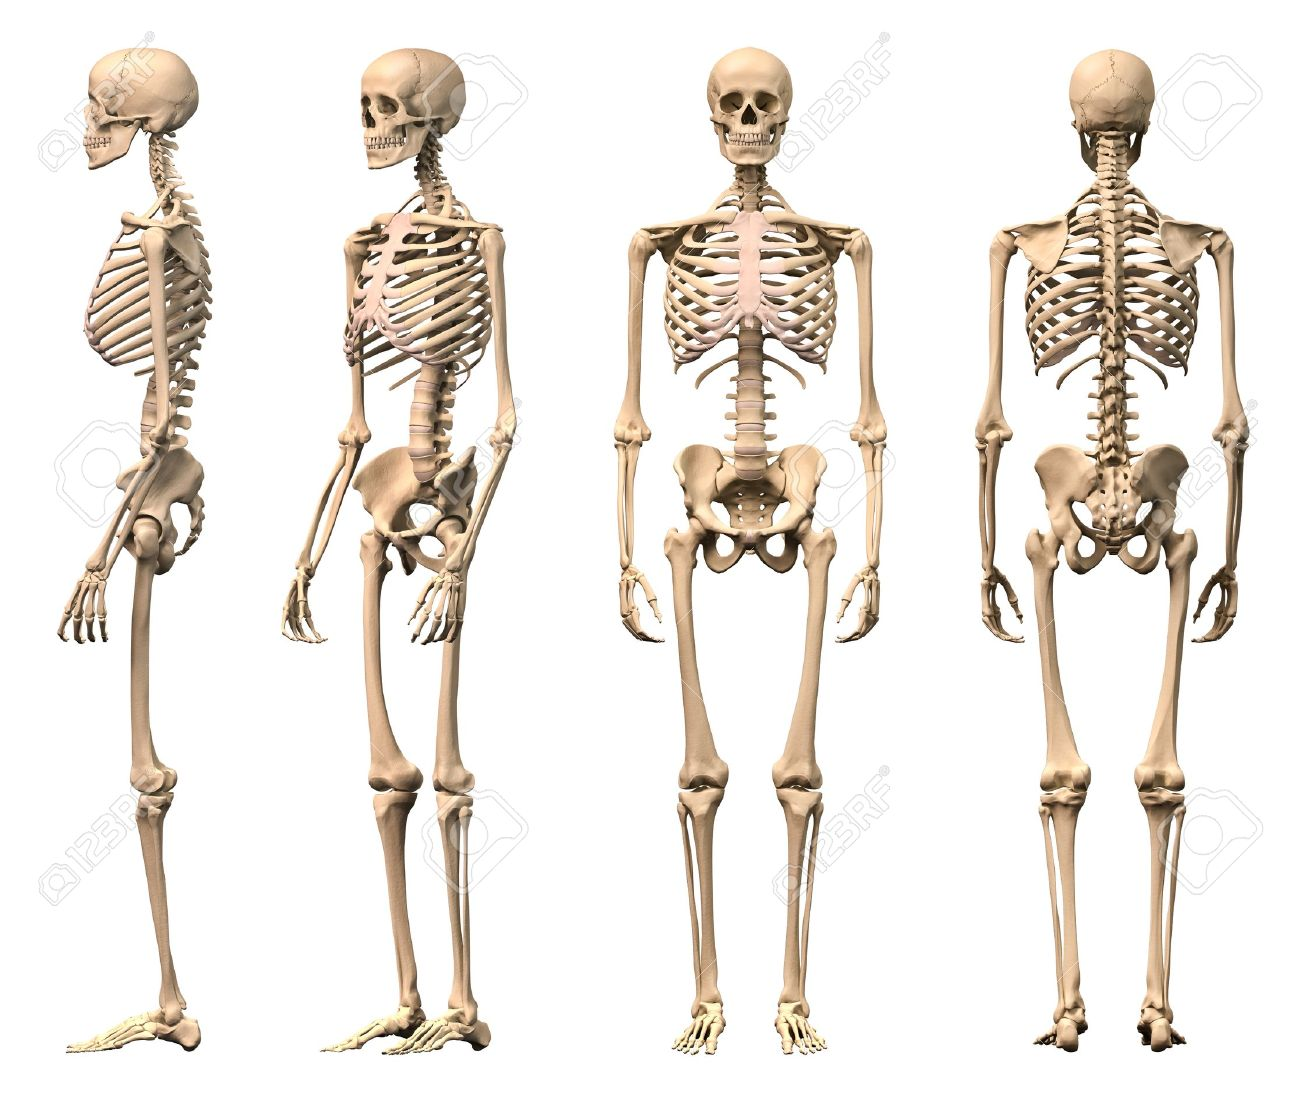 human skeleton images & stock pictures. royalty free human, Skeleton